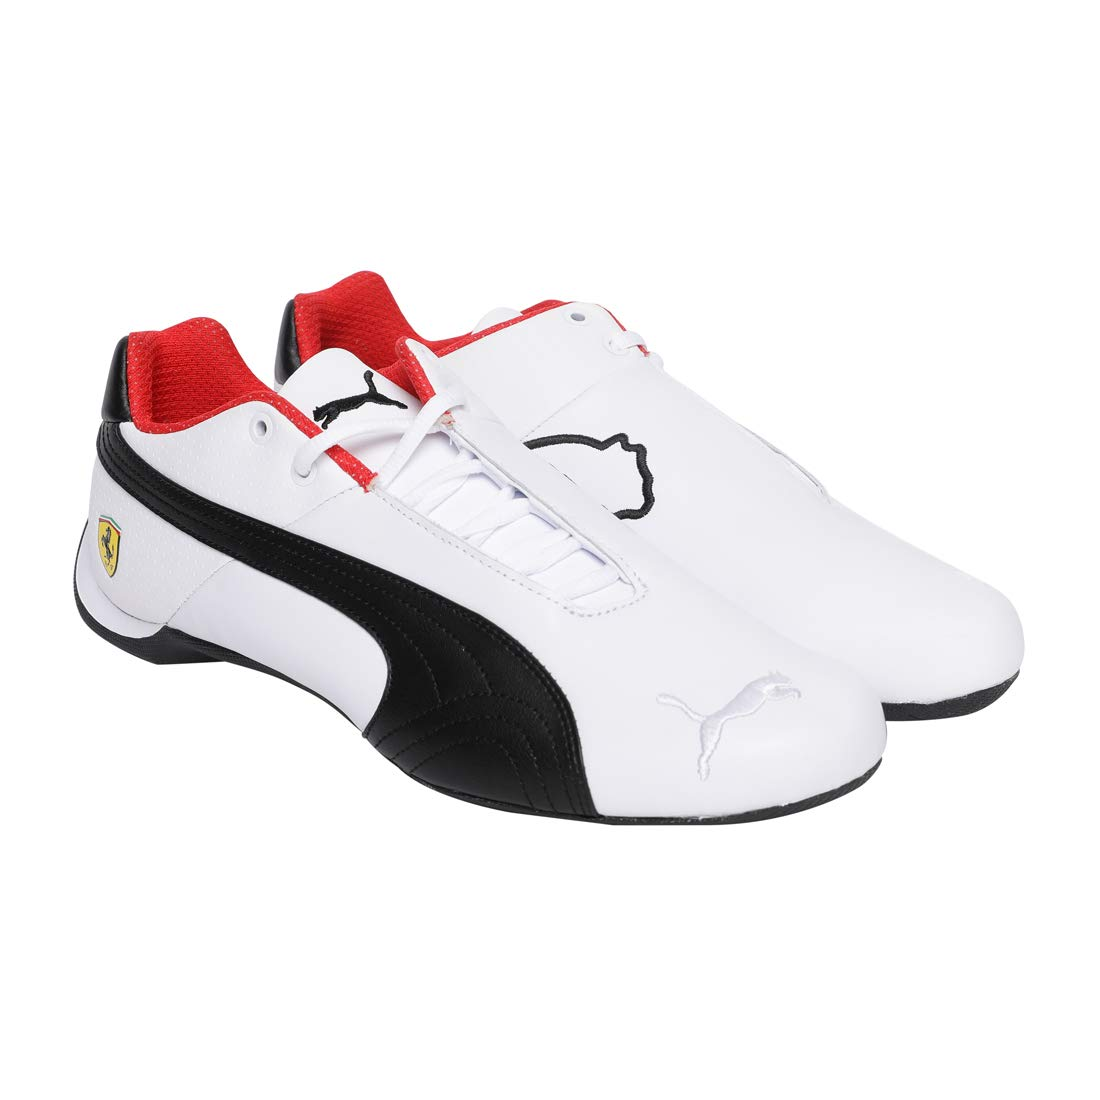 PUMA Ferrari Future Cat Original Shoes